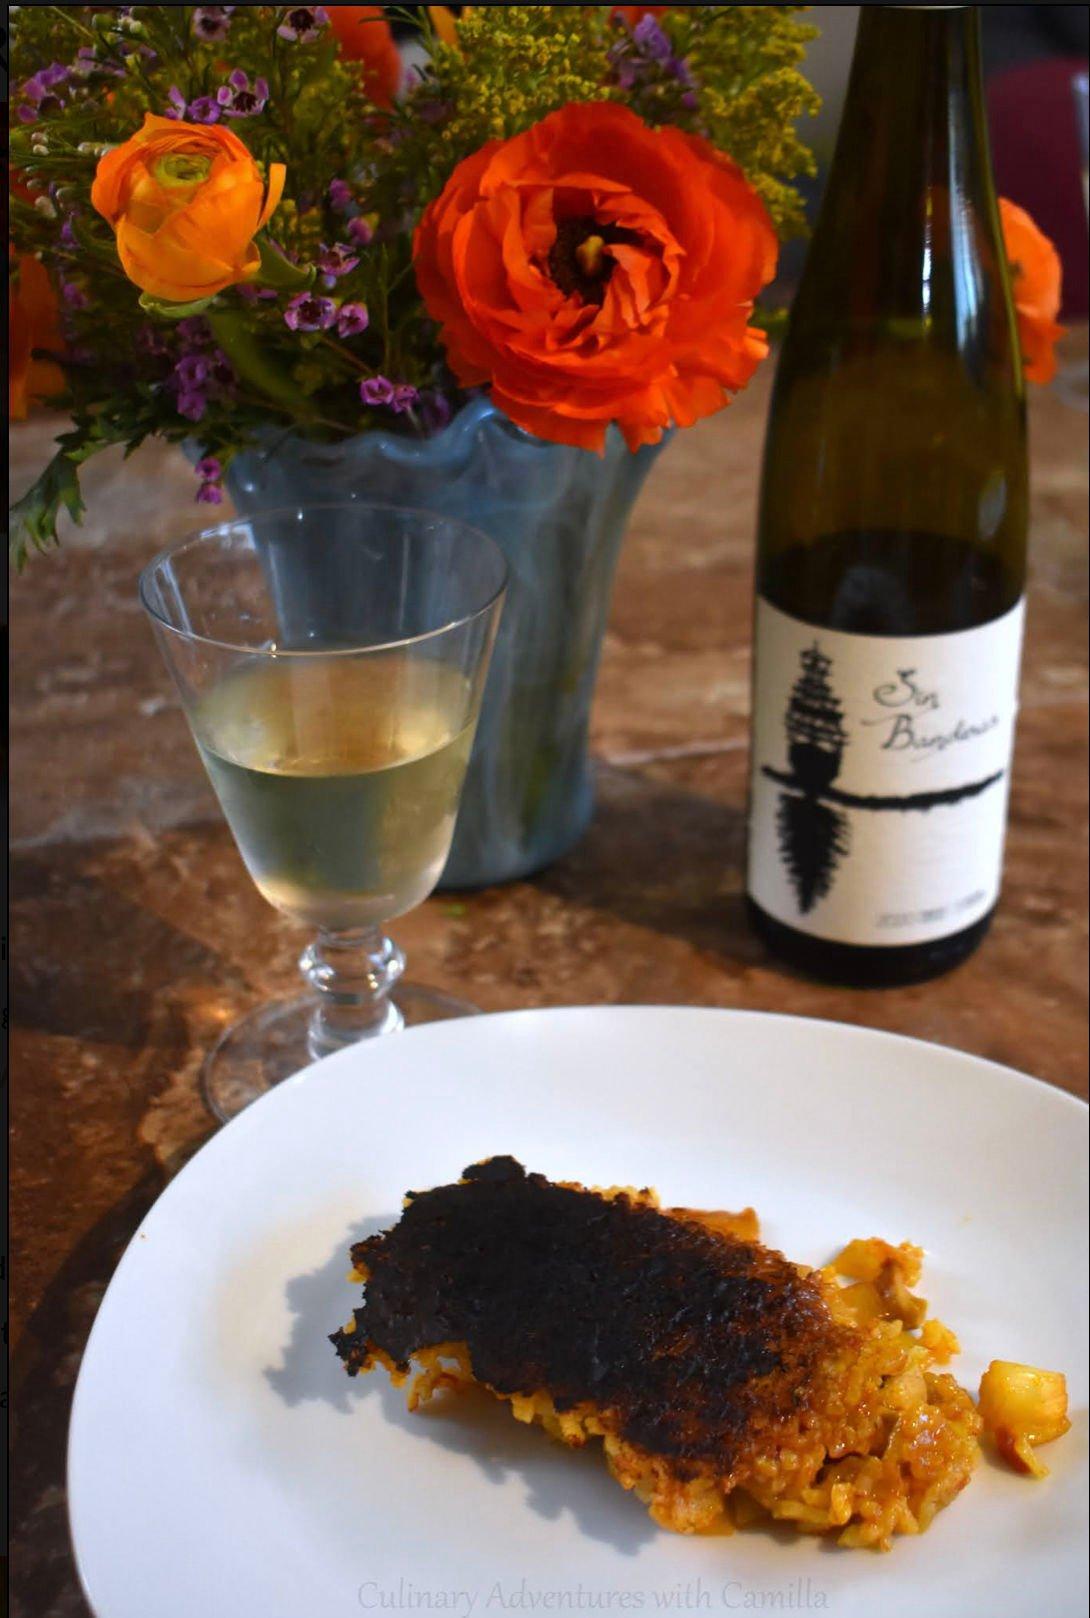 wine - Paella and Riesling.jpg